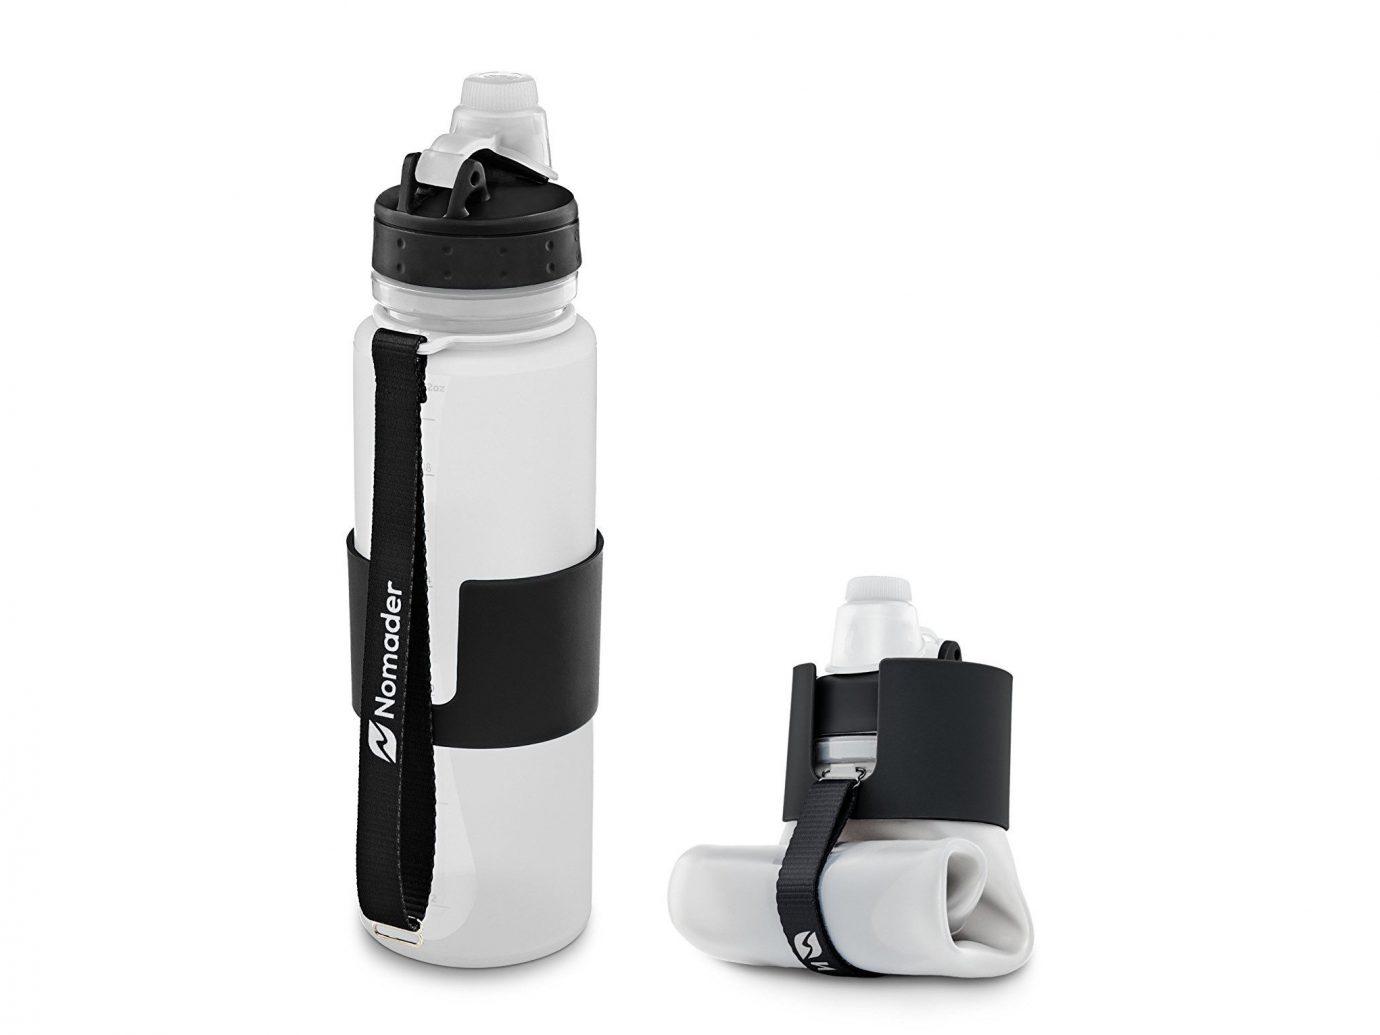 Packing Tips Solo Travel Travel Shop Travel Tips product water bottle indoor bottle product design drinkware lighter kitchen appliance